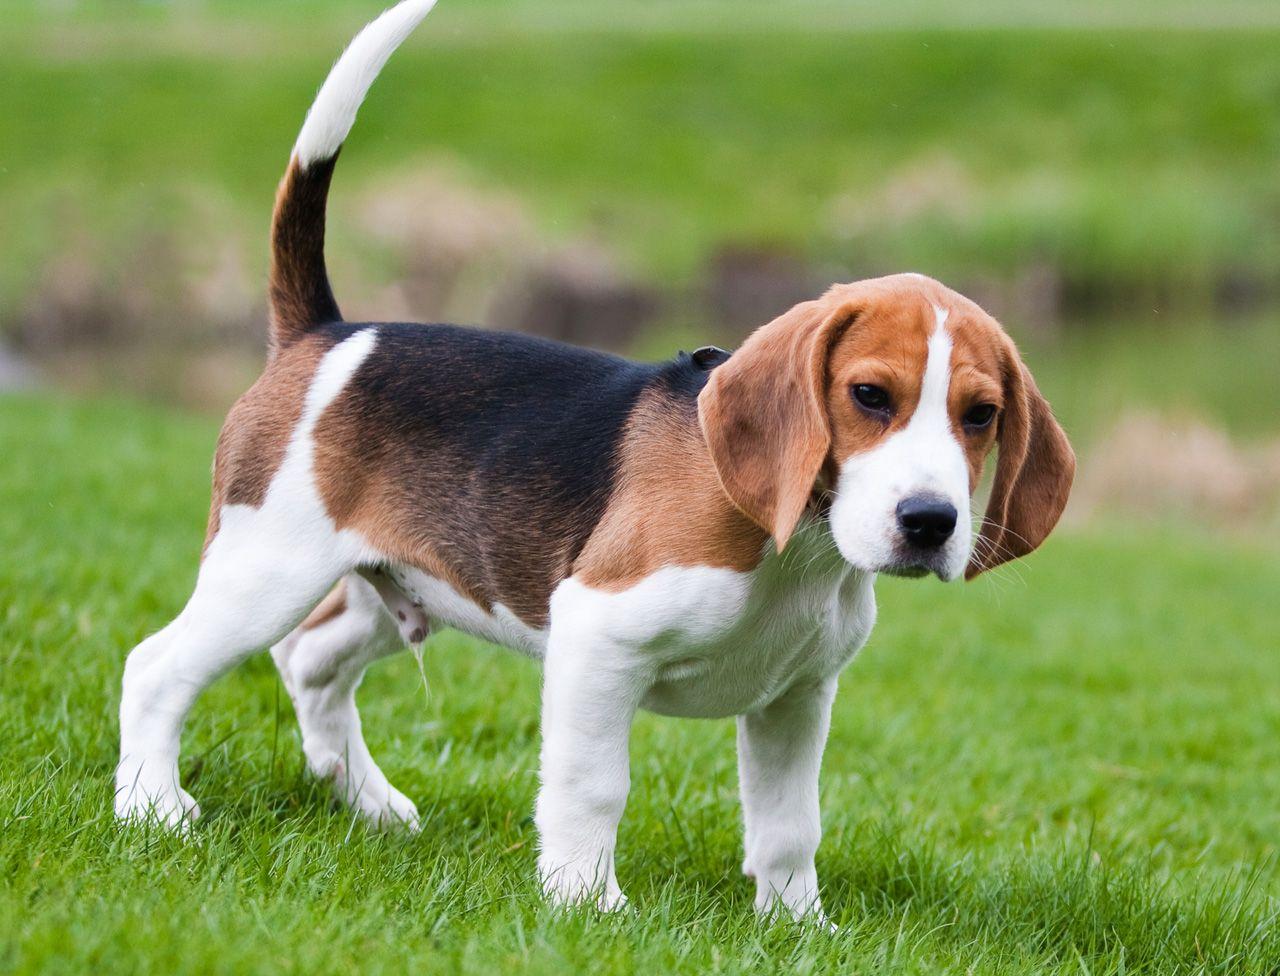 Pin By Fatih Adibelli On Dog Breeds Beagle Puppy Beagle Dog